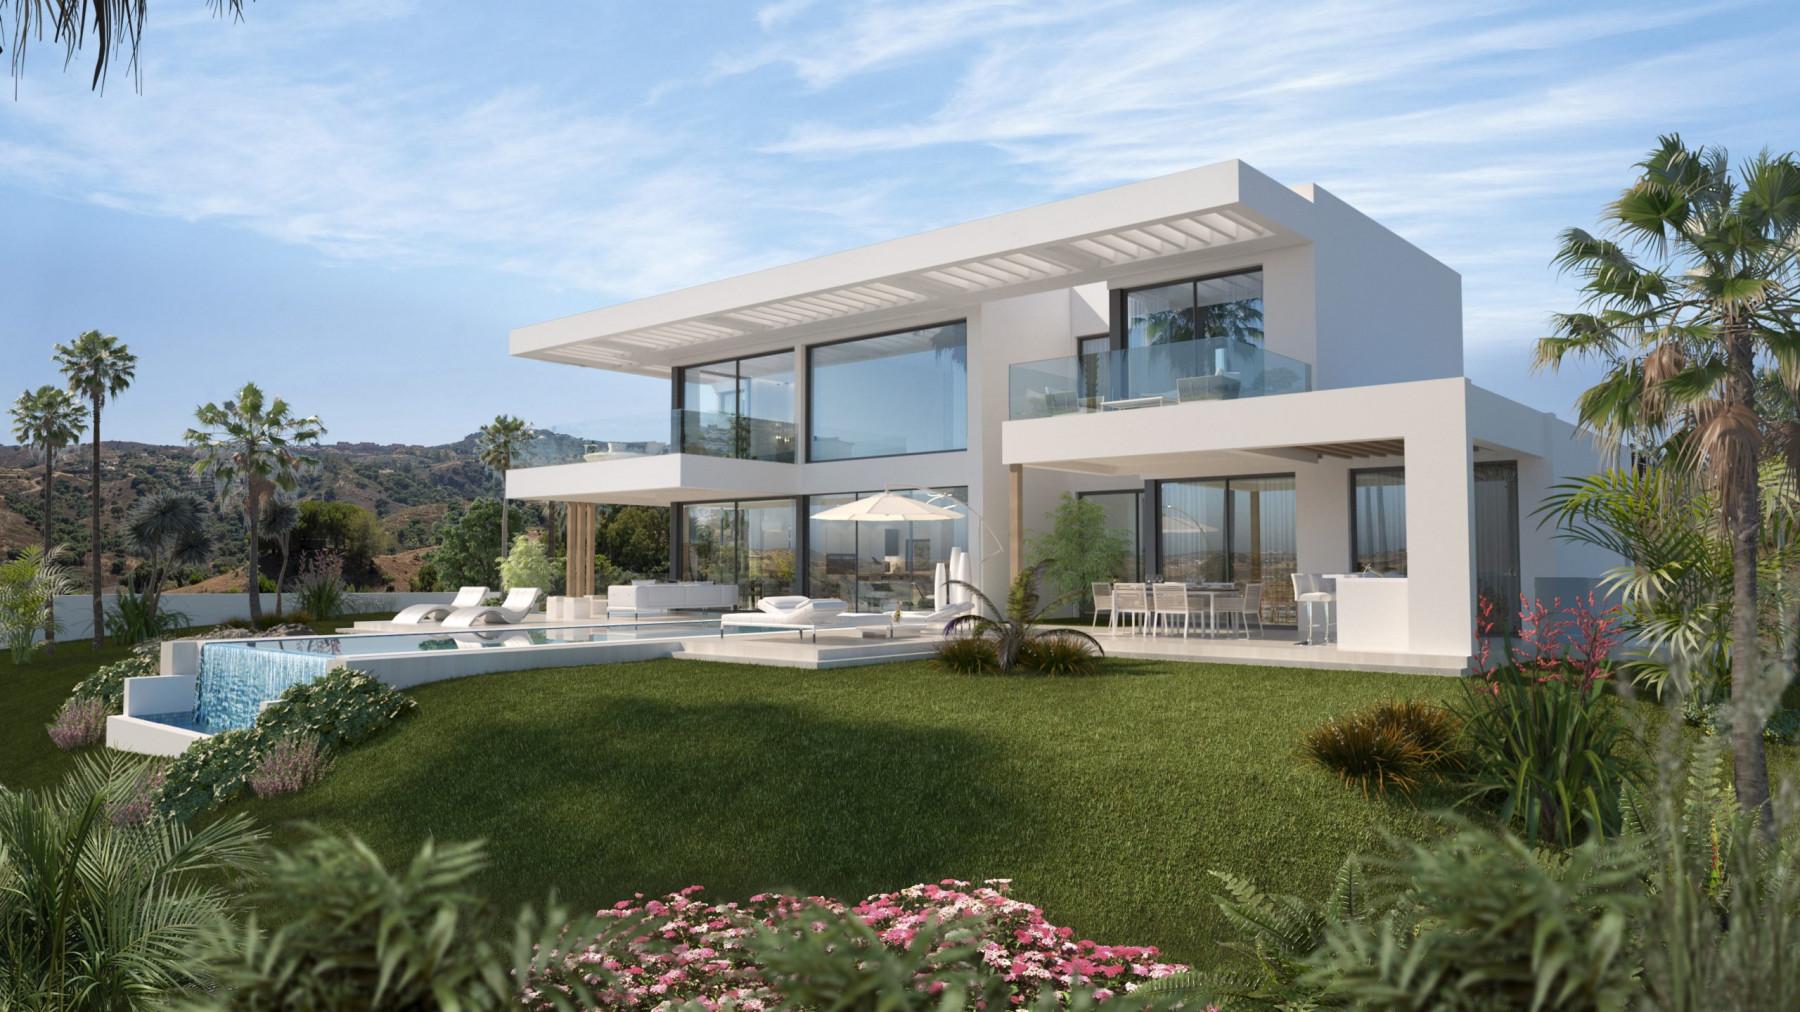 Villa-Cala-Golf-43-C2-scaled